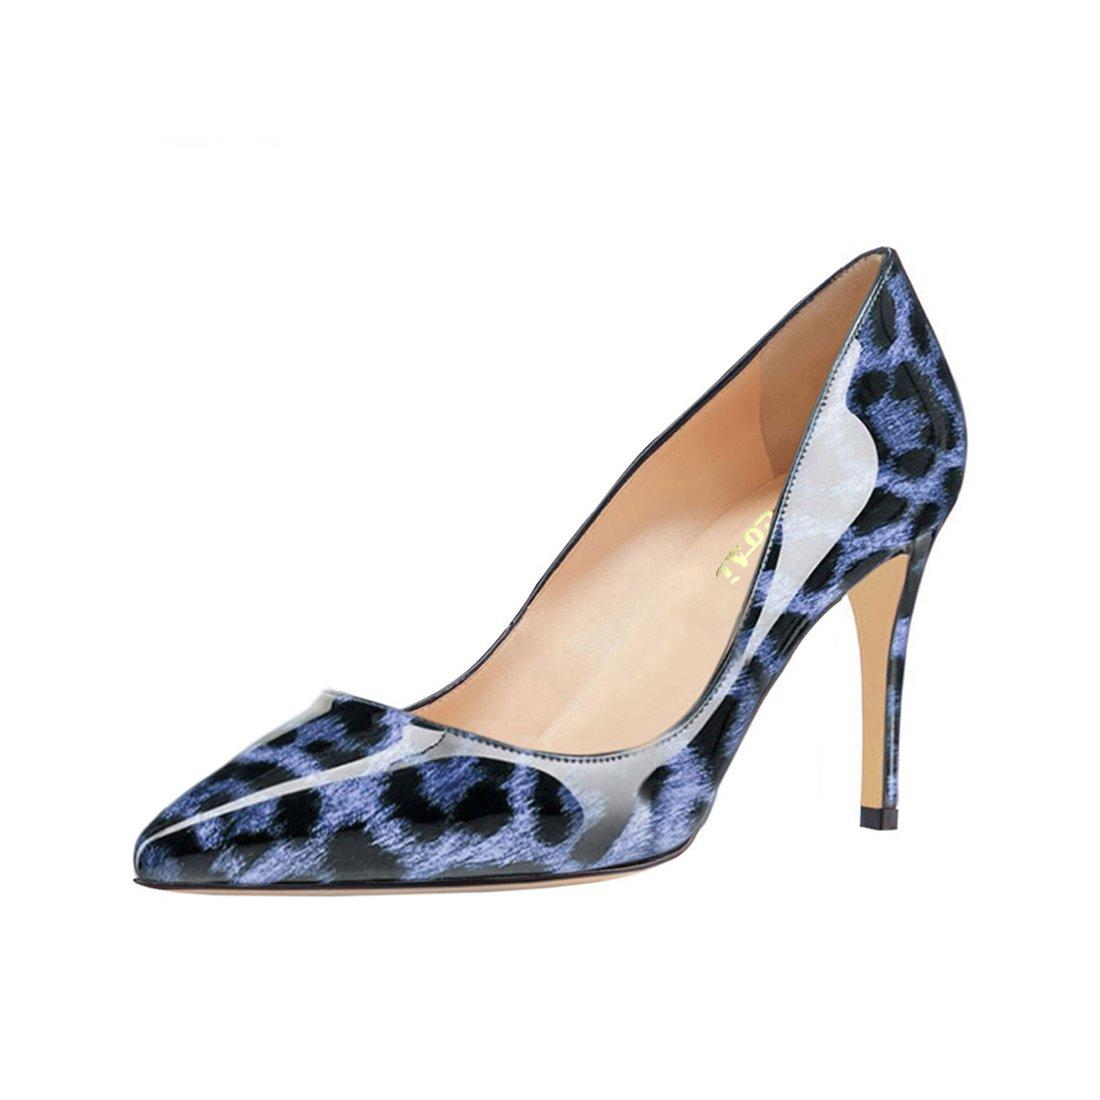 VOCOSI Women's Basic Simple High Heels Slip On Closed Pointed Toe Ladies Dress Pumps B078W73X4F 13 B(M) US|Blue Leopard-patent